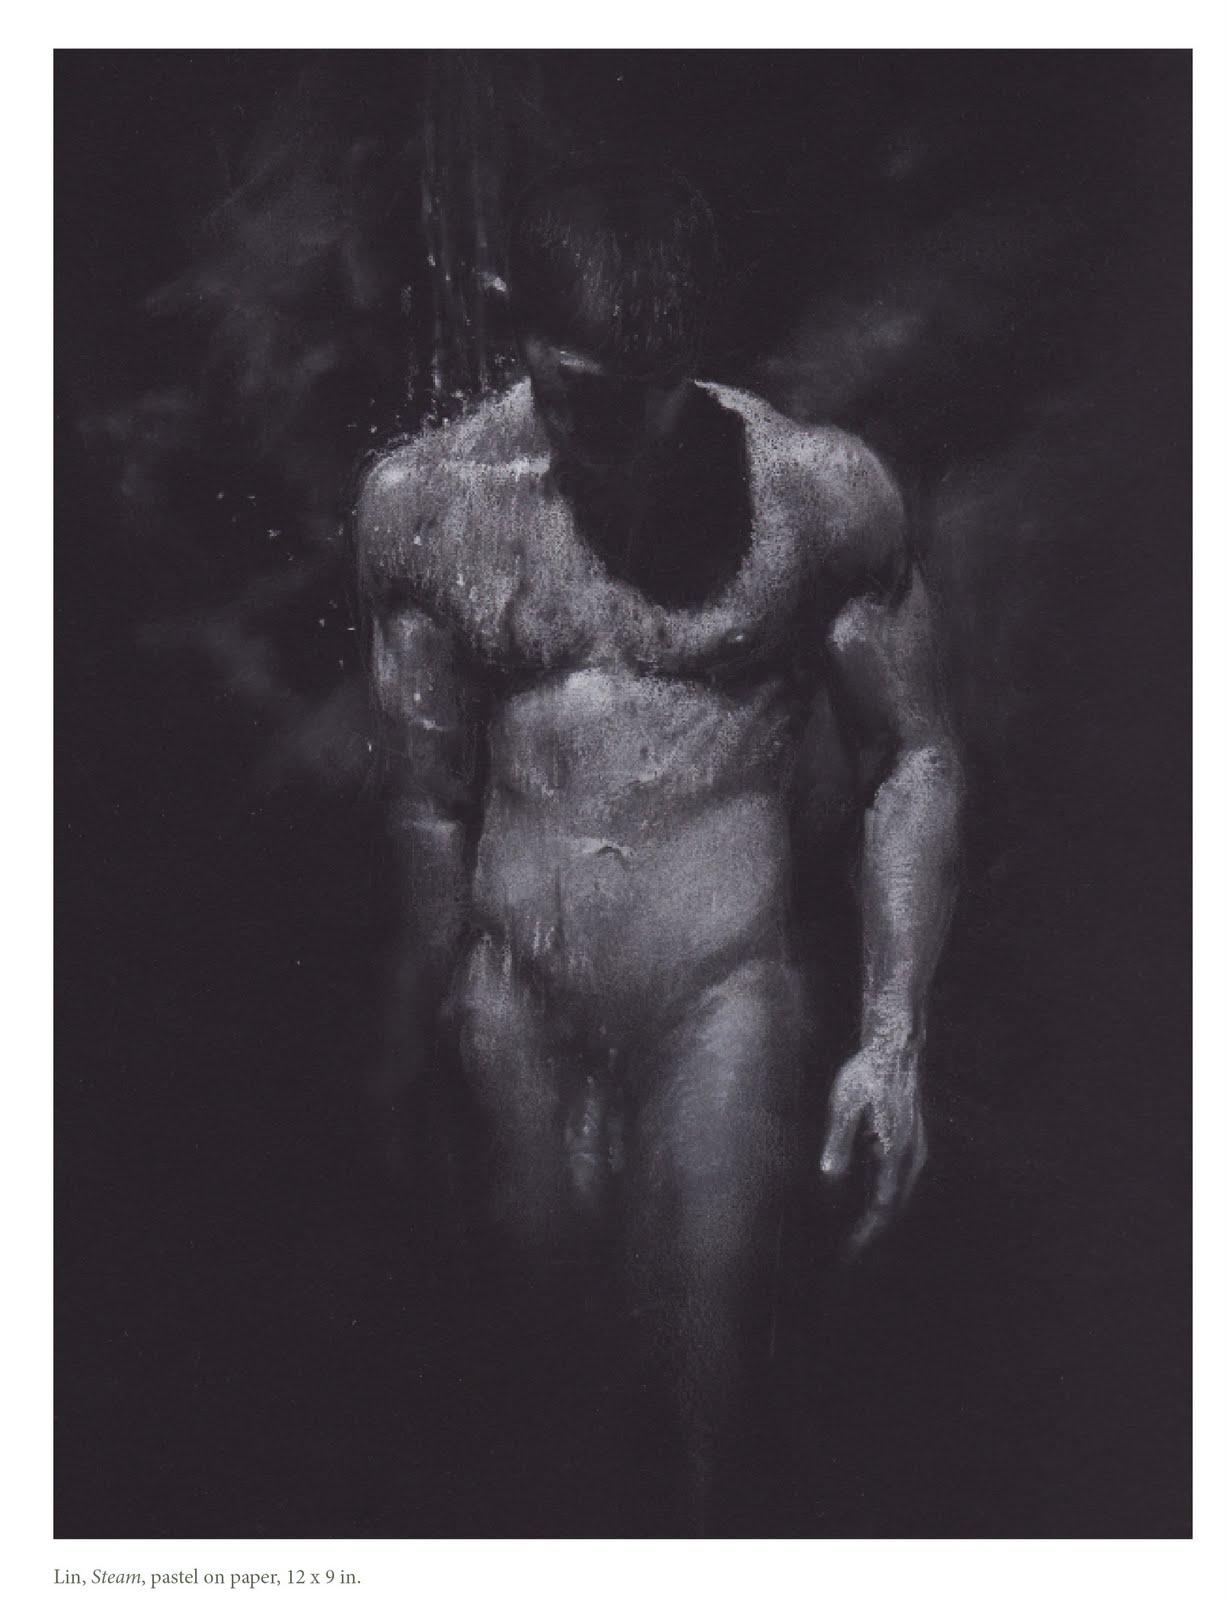 Male art online pics 88